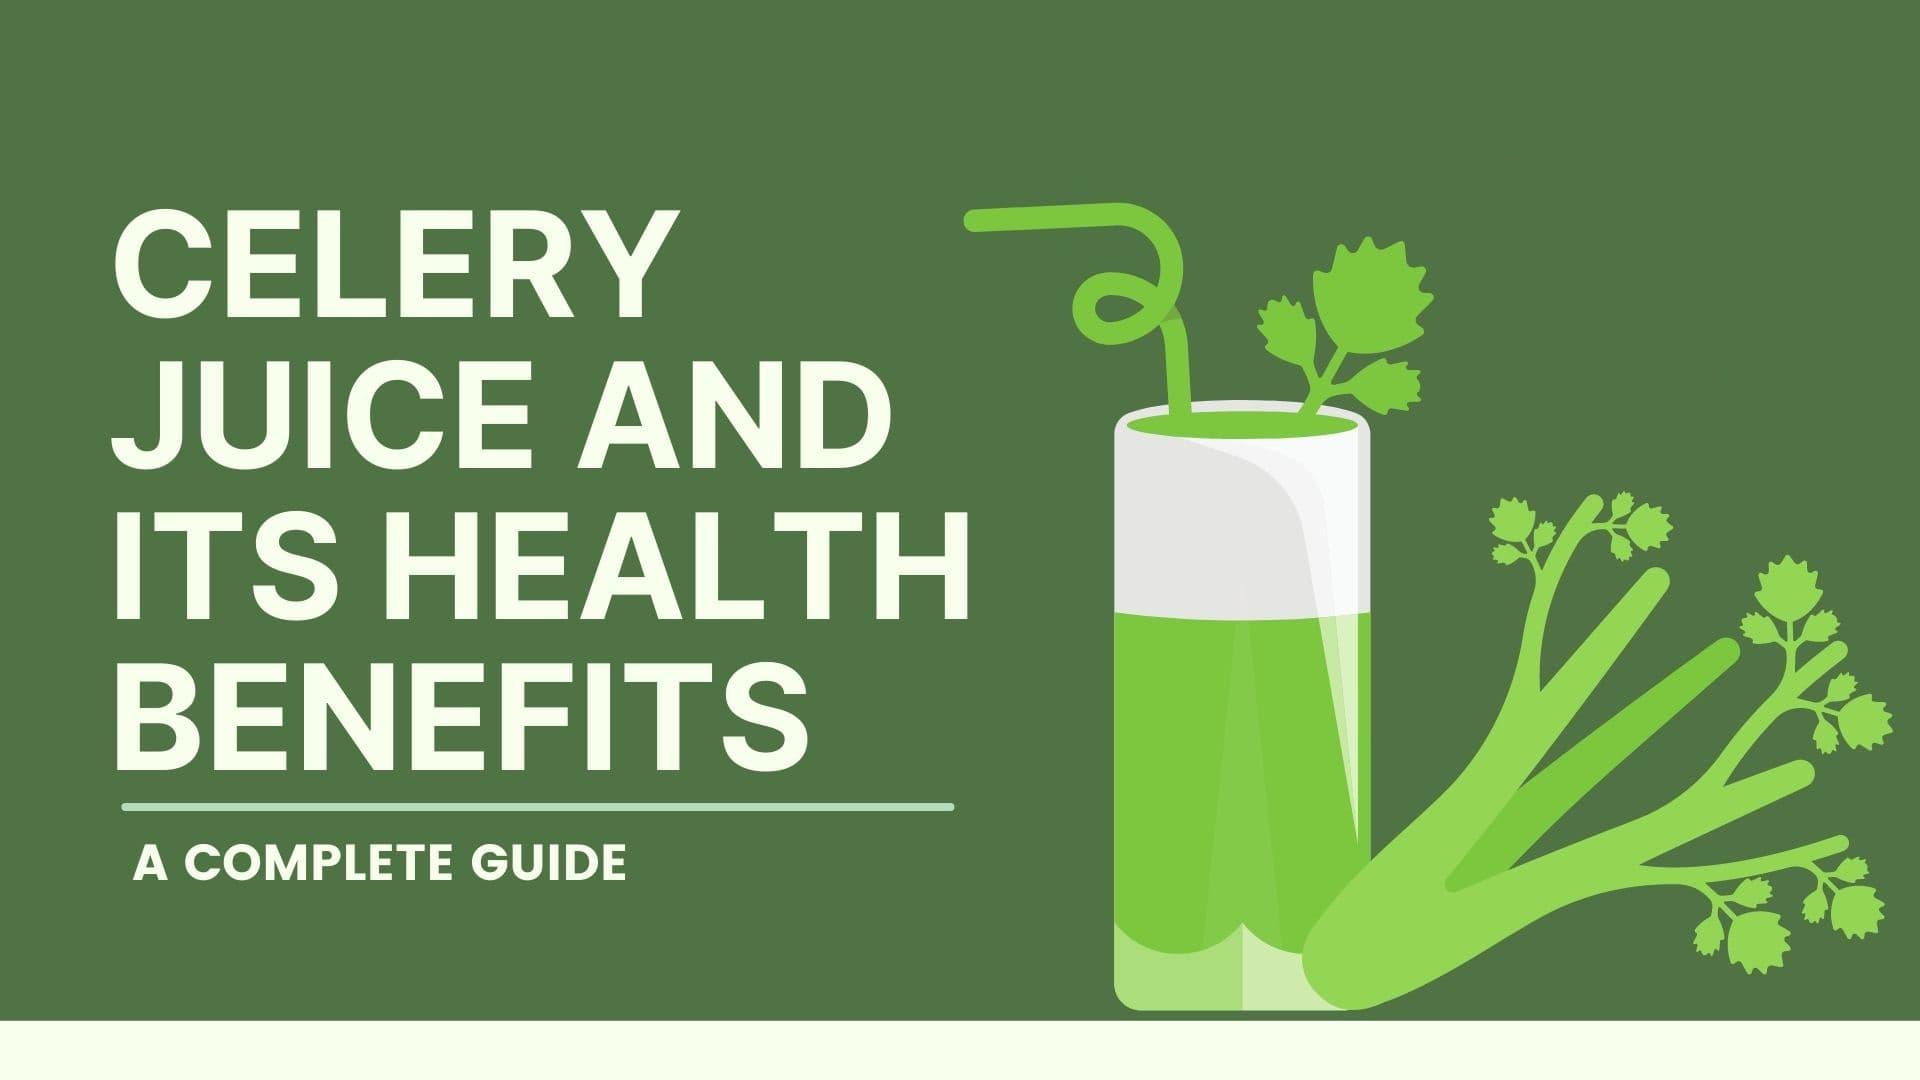 Celery Juice and its Health Benefits